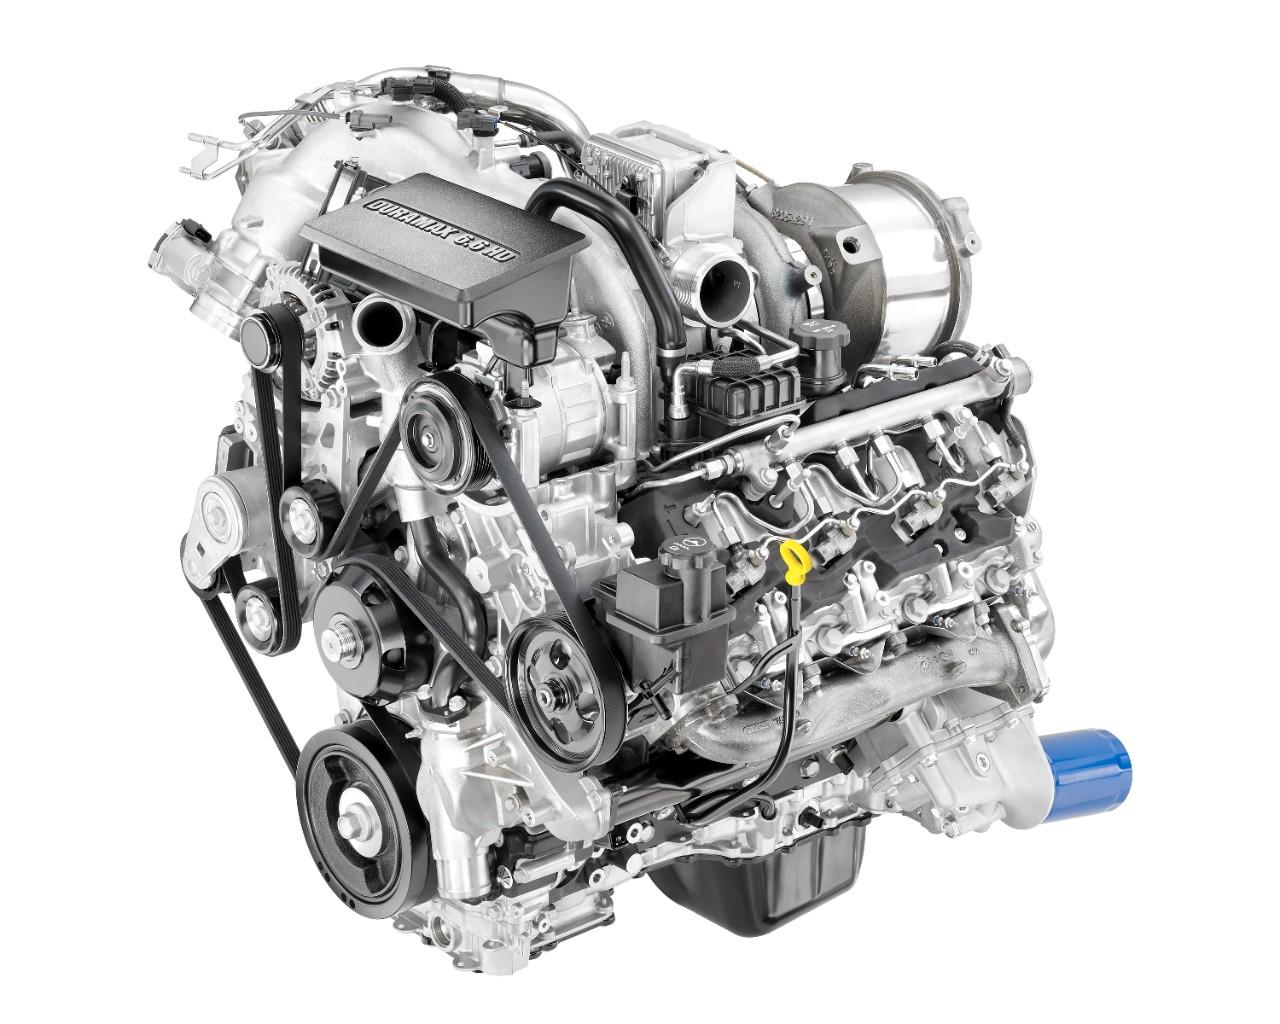 Ford 1600 Starter Wiring Diagram Gm 6 6l L5p V 8 Turbo Diesel Duramax Engine Info Specs